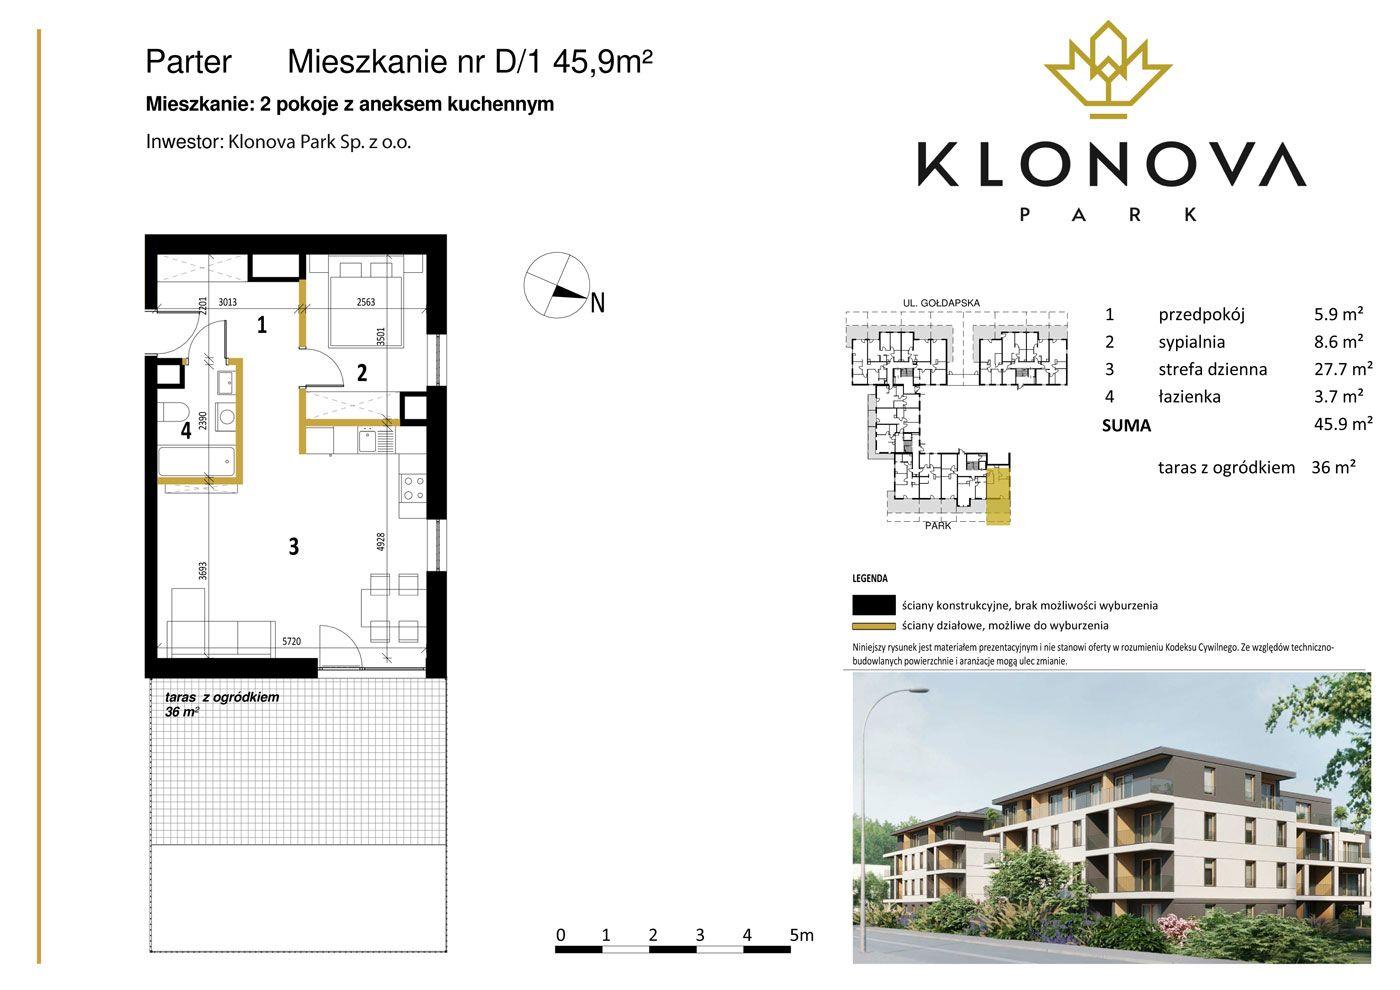 Apartamenty Klonova Park - Plan mieszkania D/1